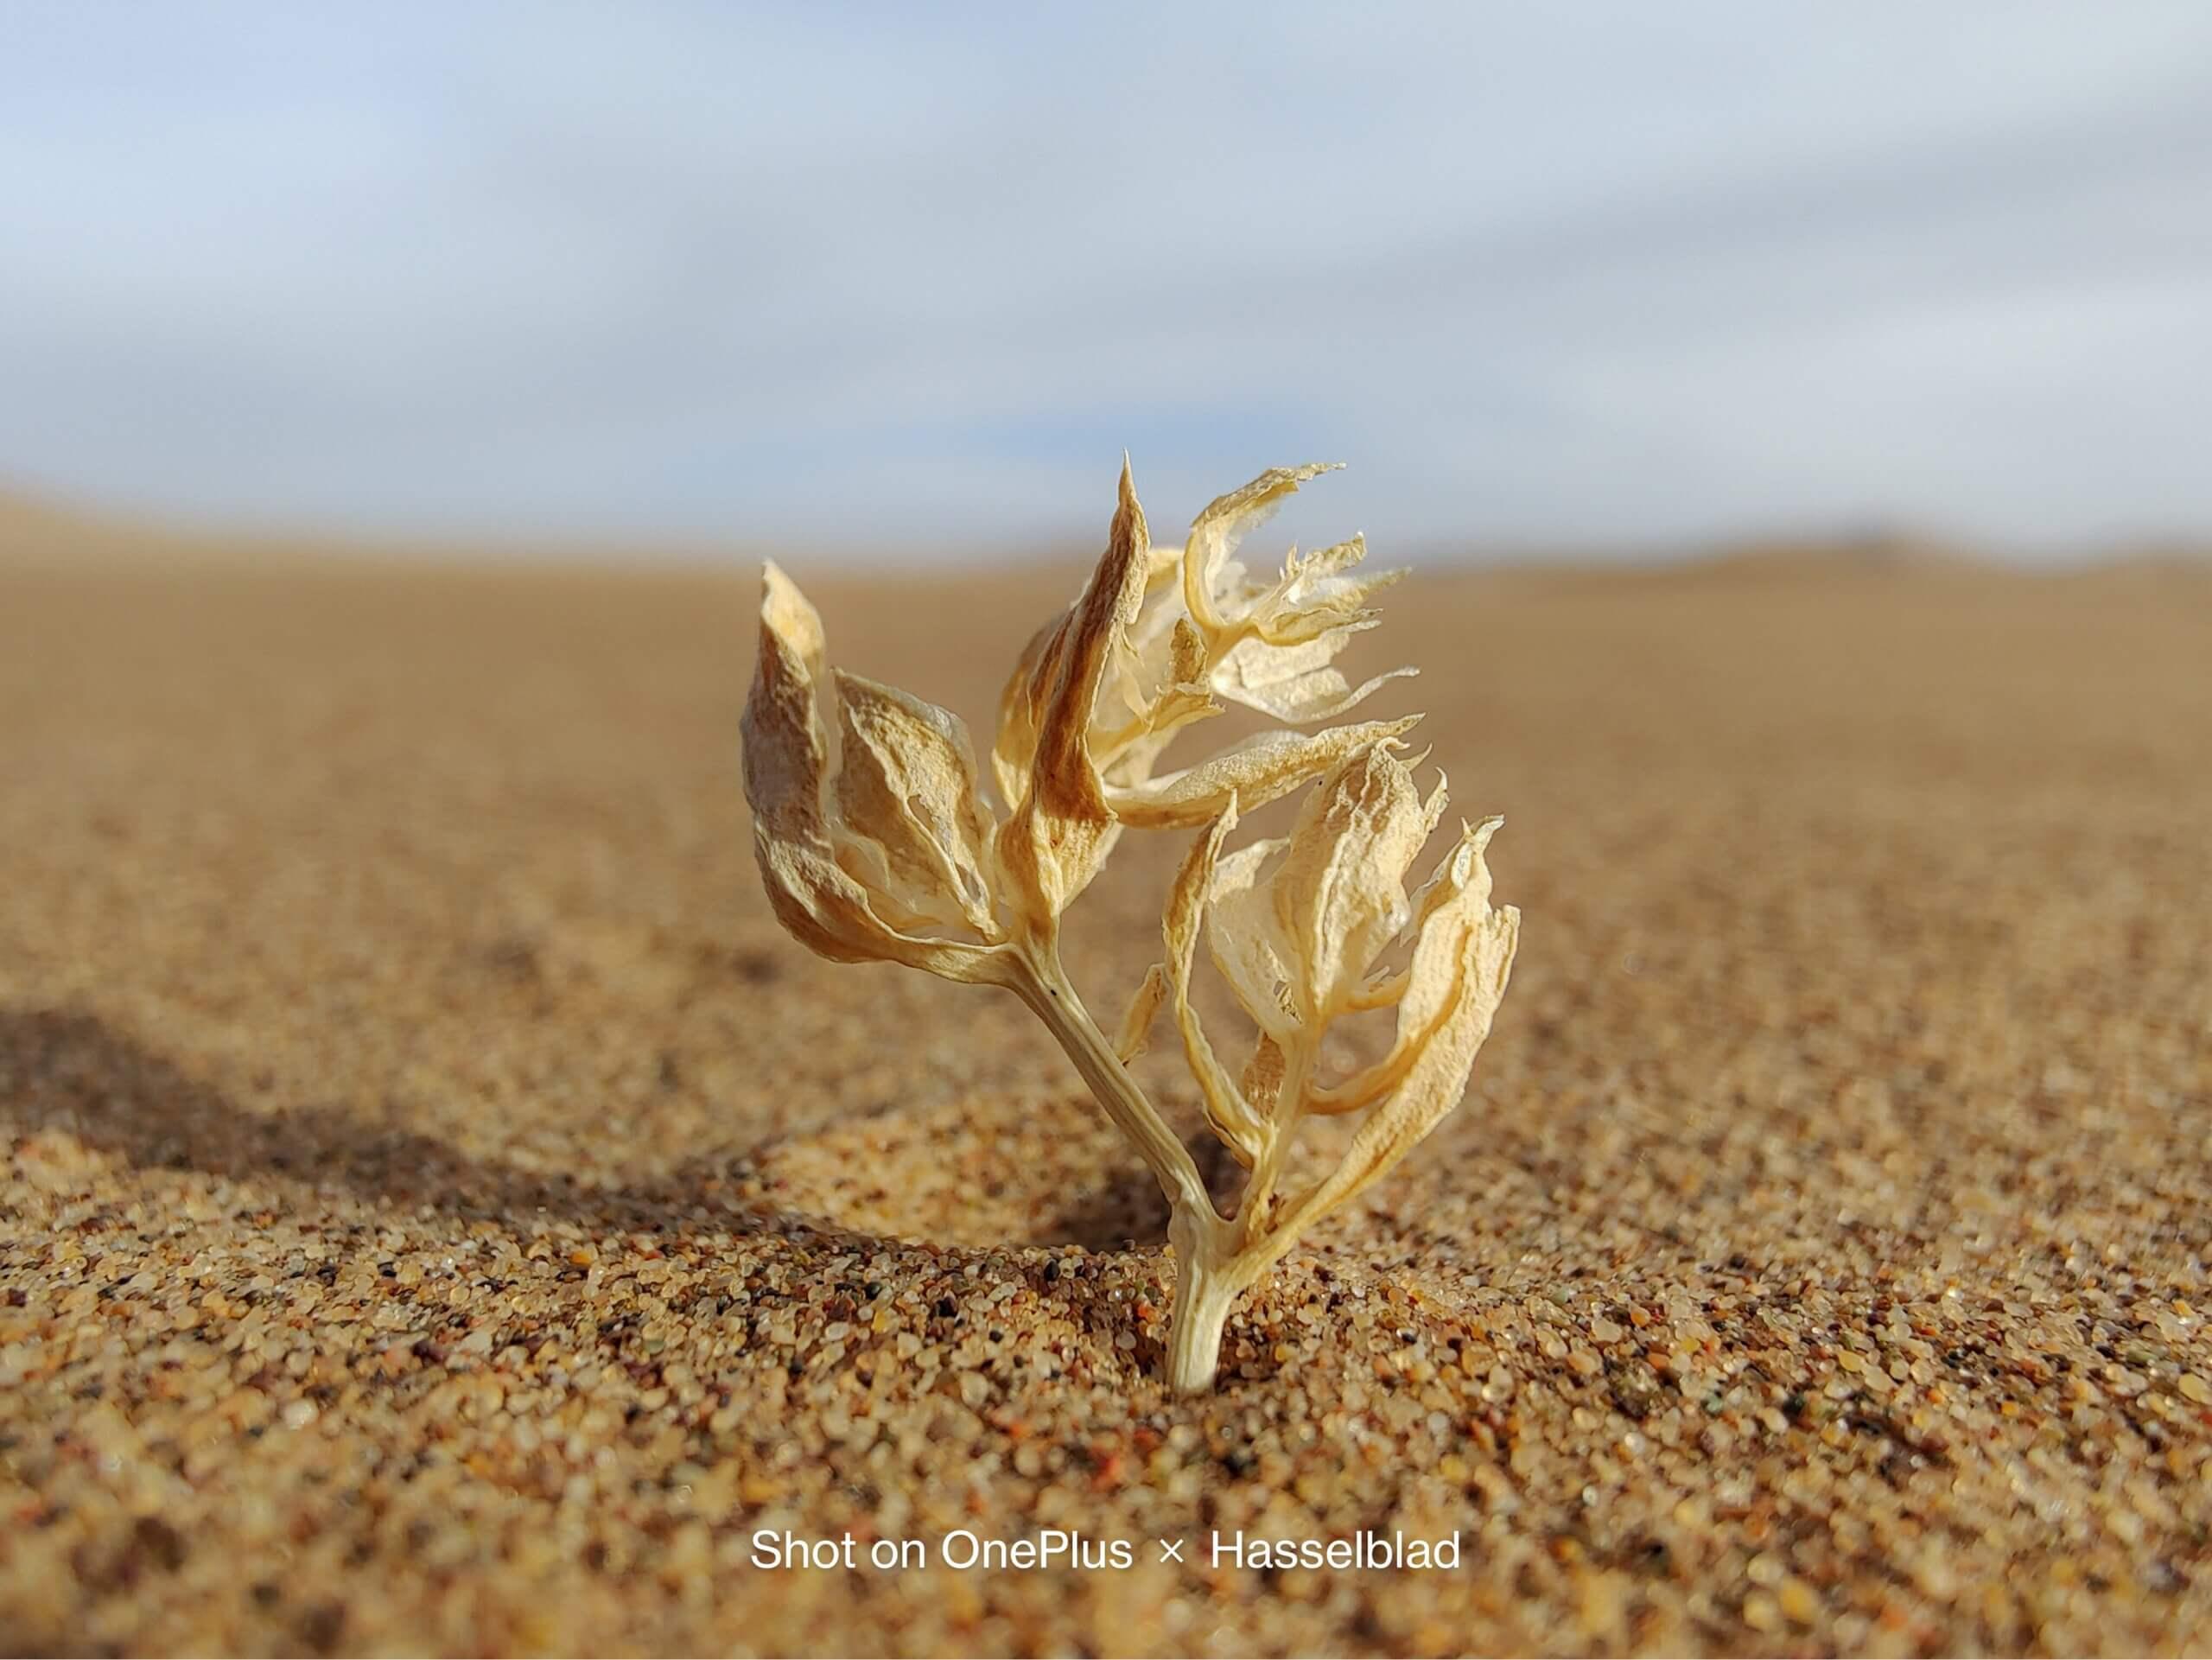 OnePlus 9シリーズで撮影した砂漠の写真